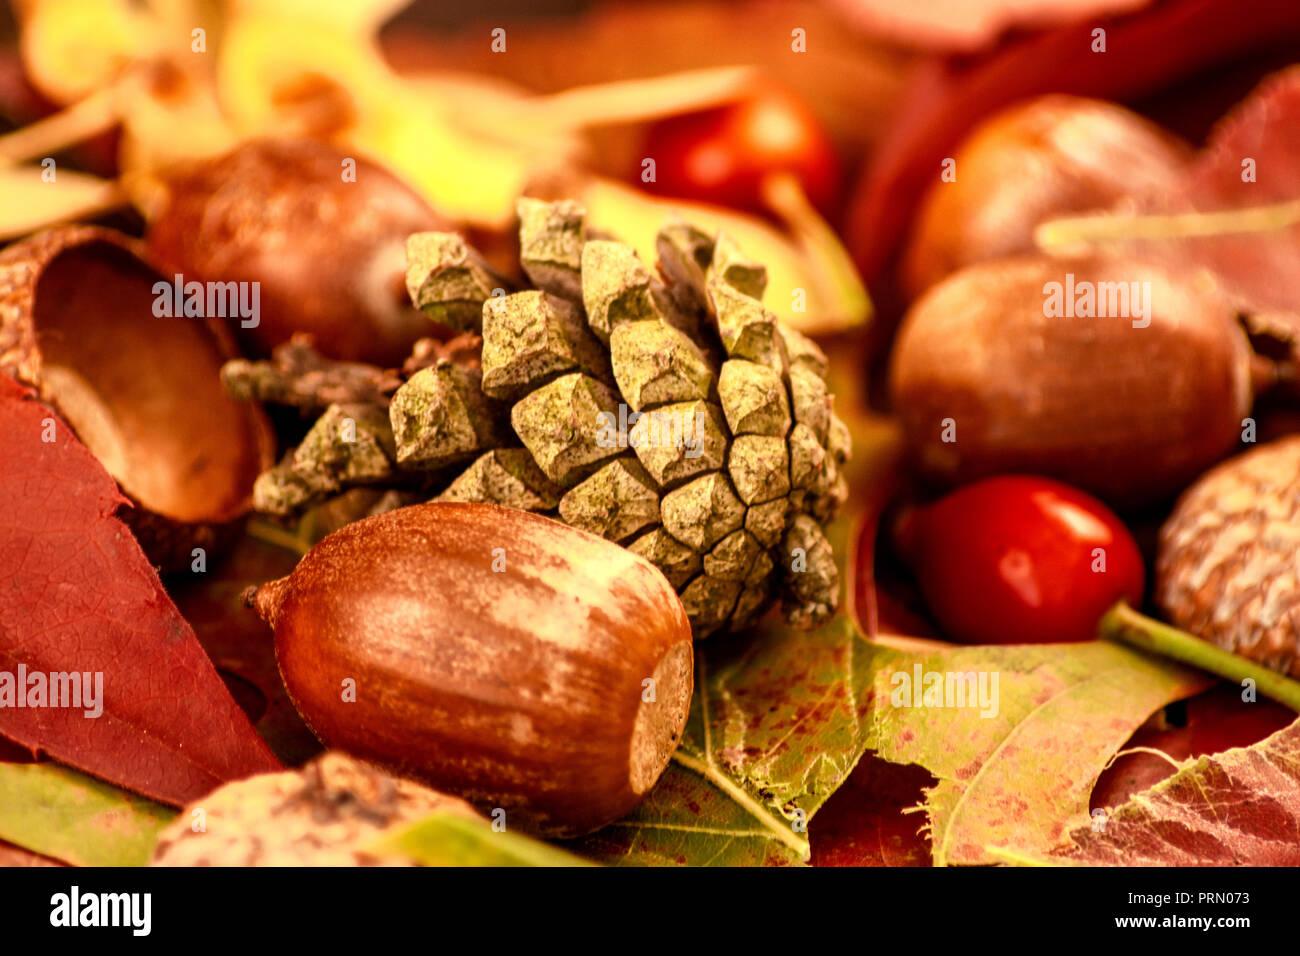 Konzept im Herbst: Arbores autumnales effectu Stockbild